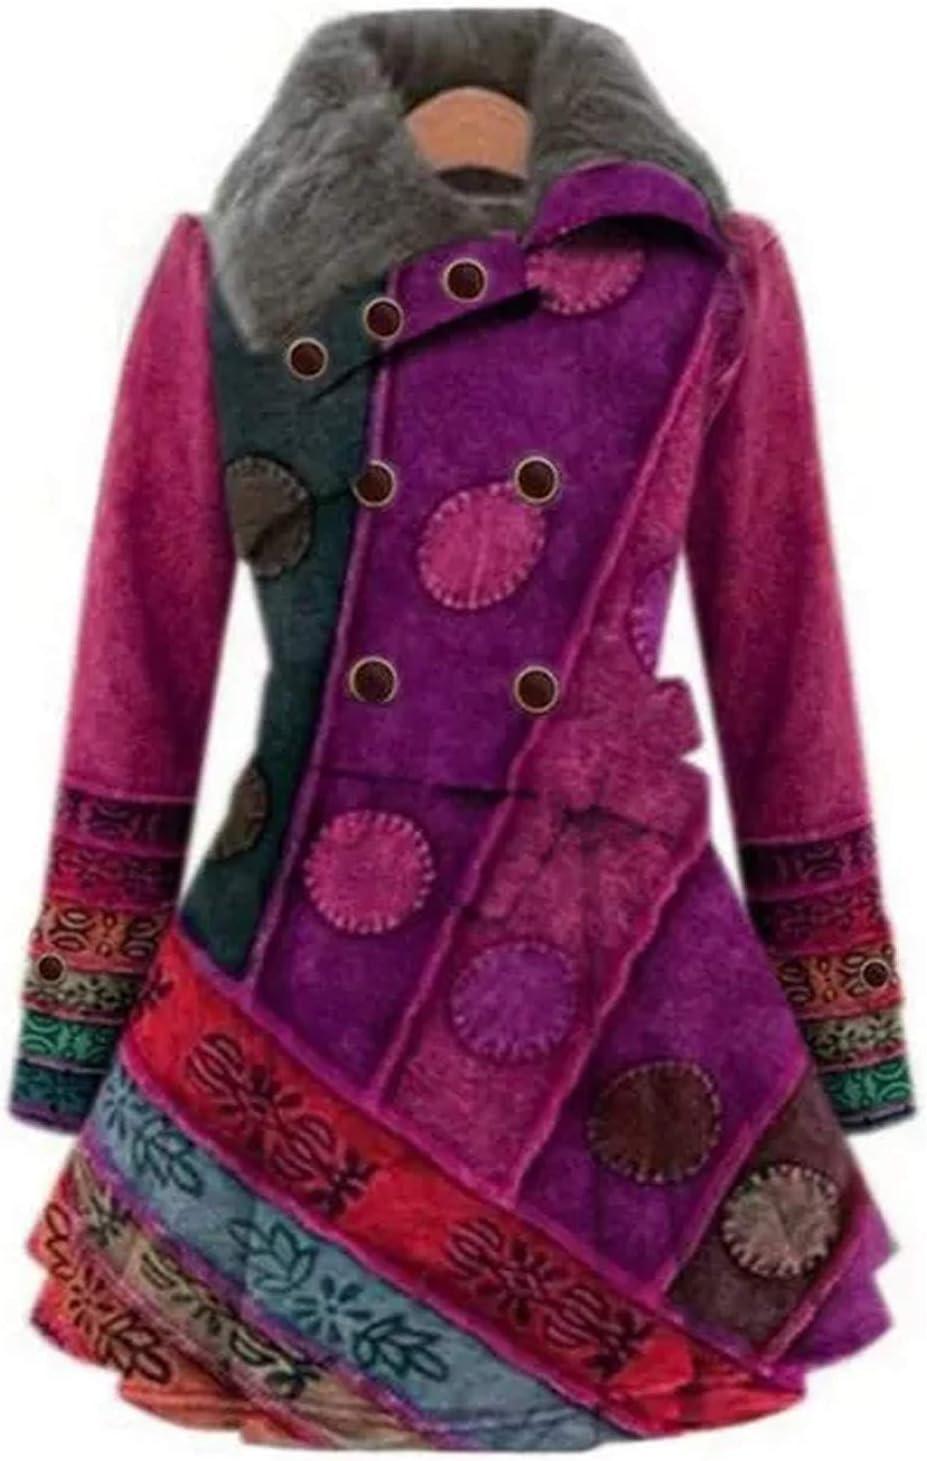 TopLAD Fashion Women Lapel Buttons Coats with Belt Winter Warm Lapel Gradient Printed Jackets Casual Buttons Cardigan Fleece Outwear Ladies Plus Size Coat